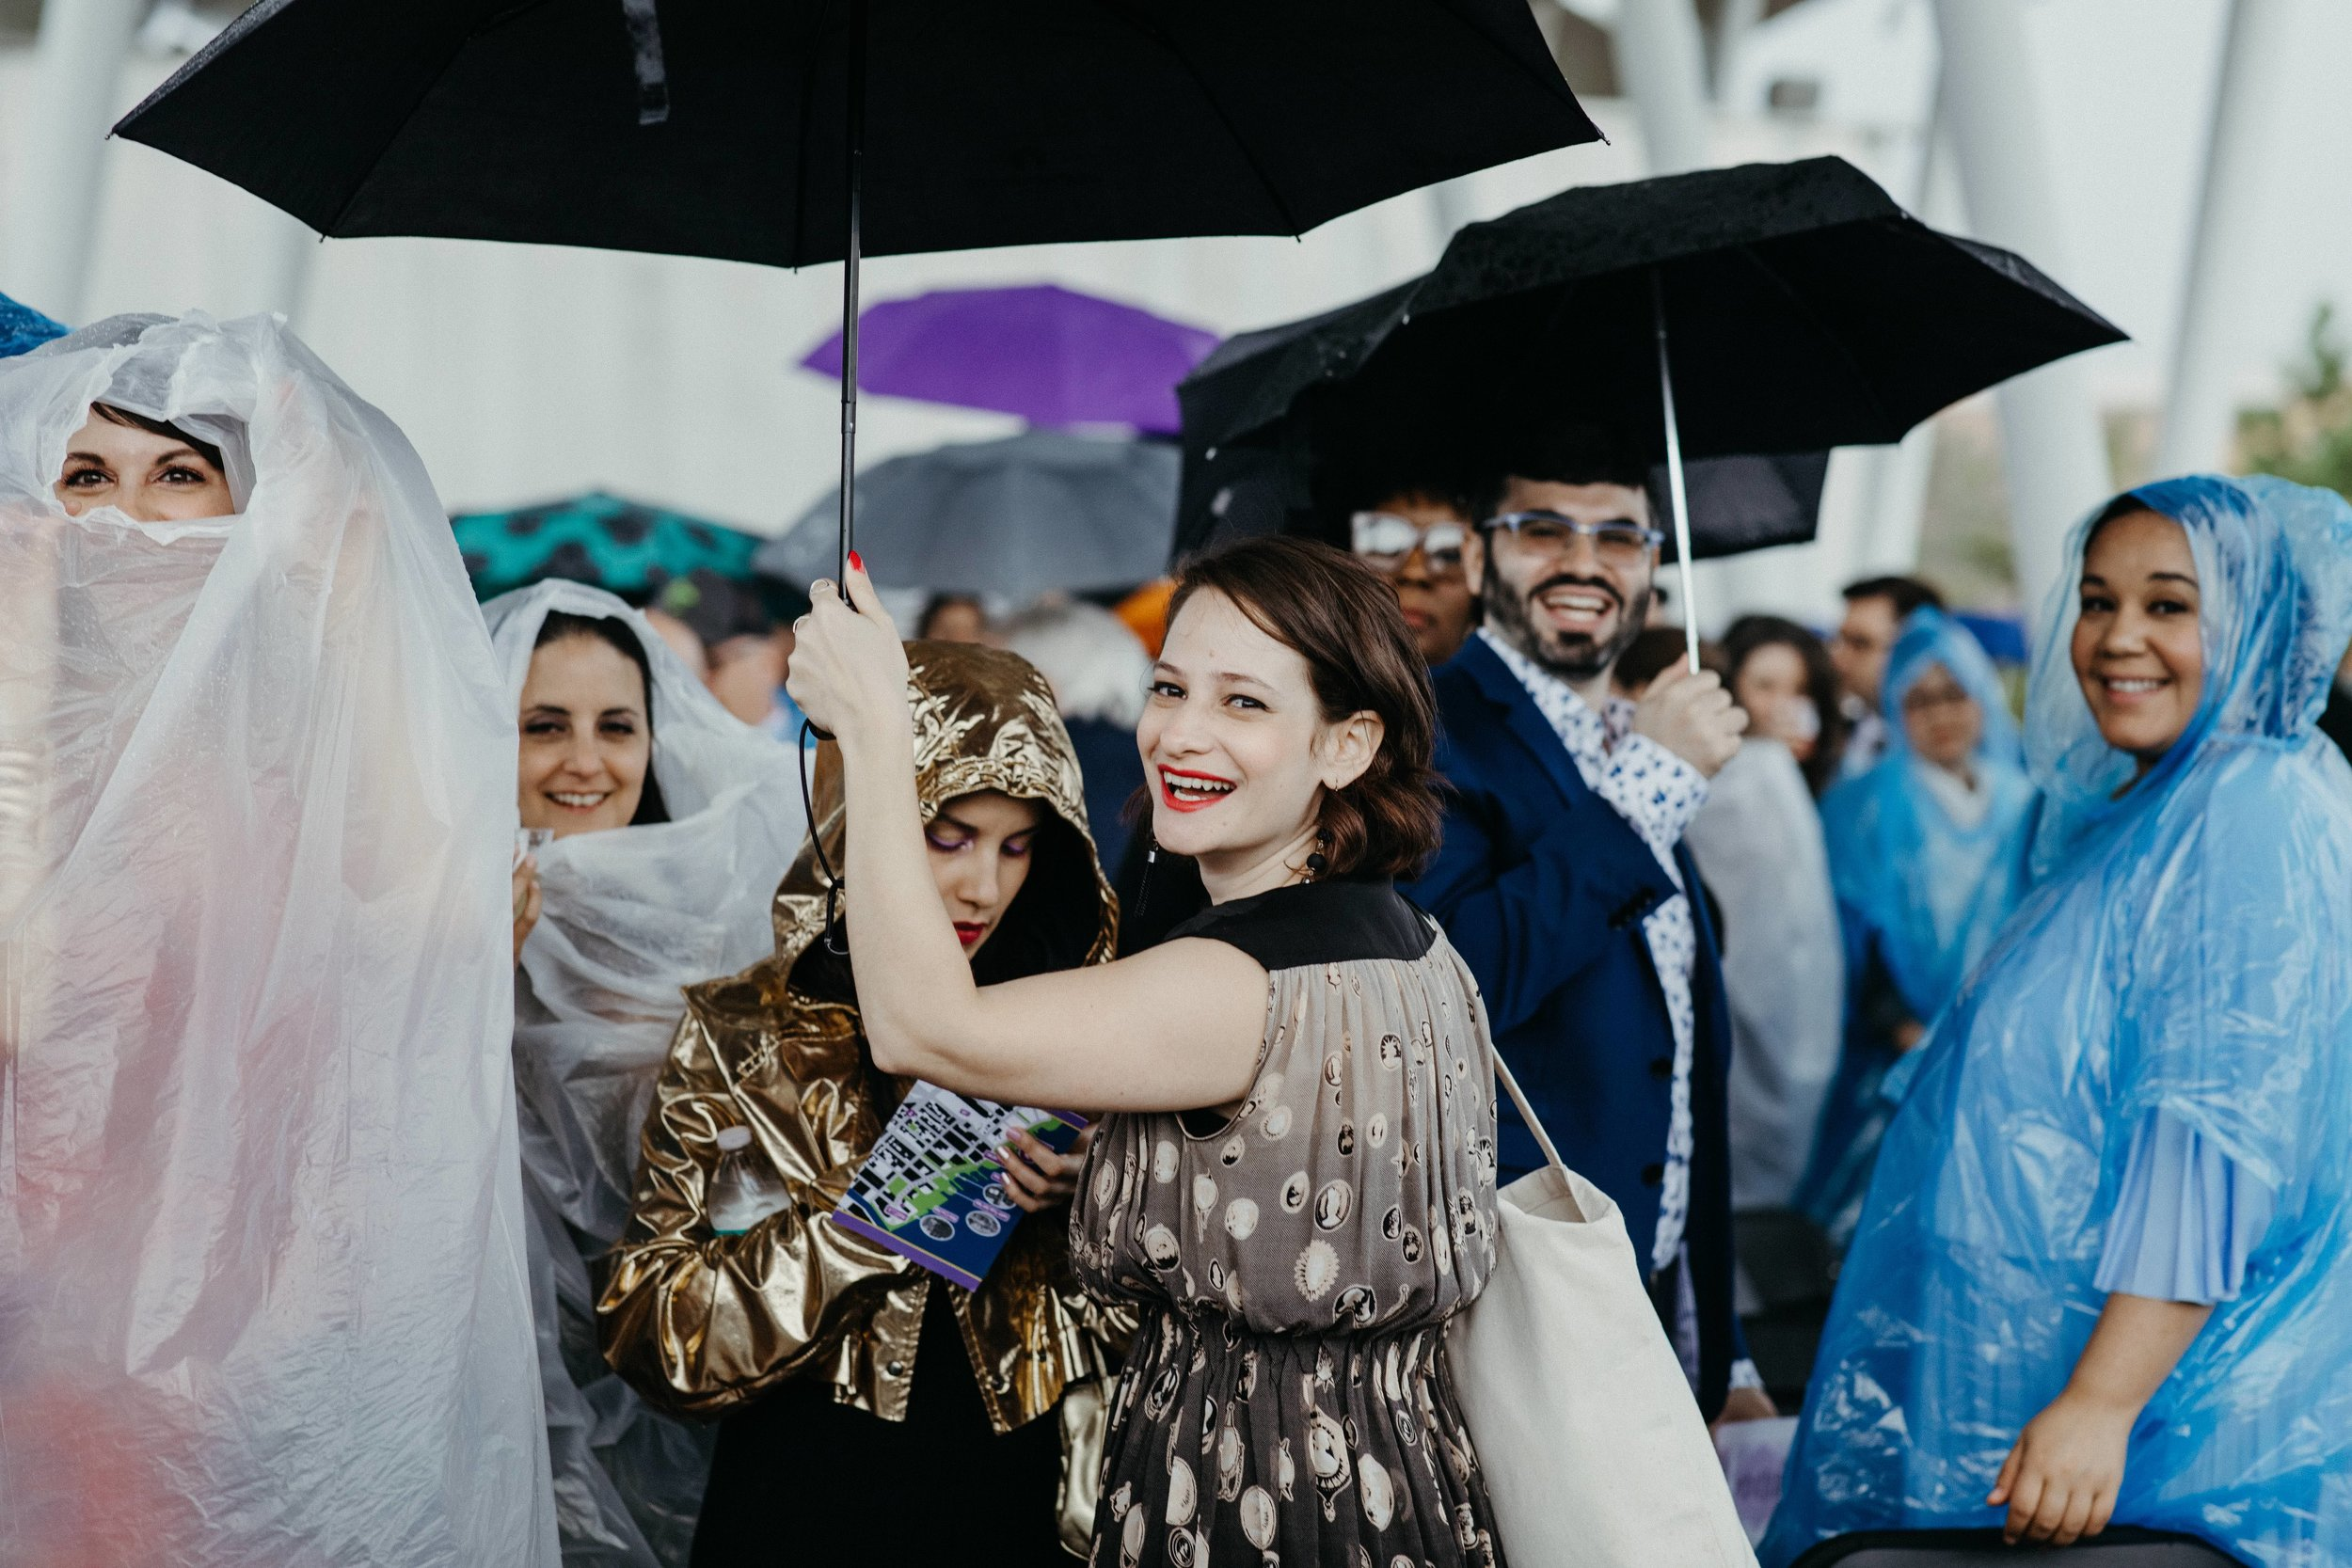 Sevlynn-Photography-Wedding-LIC-Landing-Maiella-NYC-36.jpg